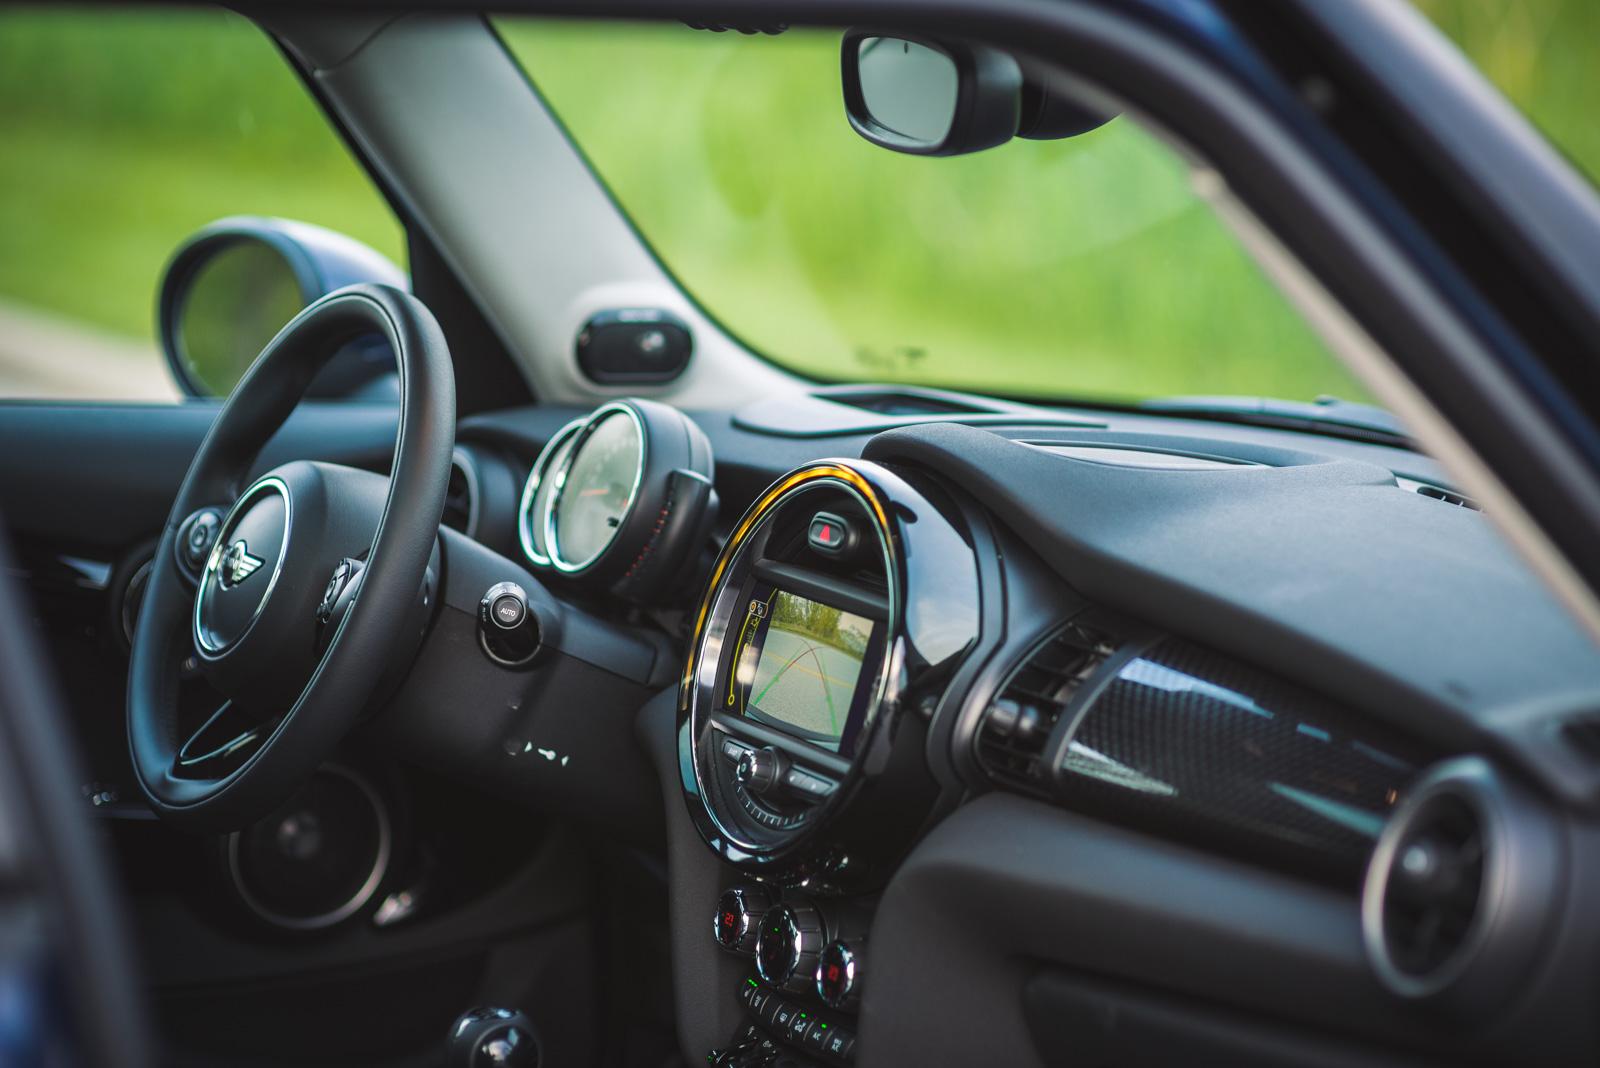 Review: 2015 MINI Cooper S 5-Door  Canadian Auto Review